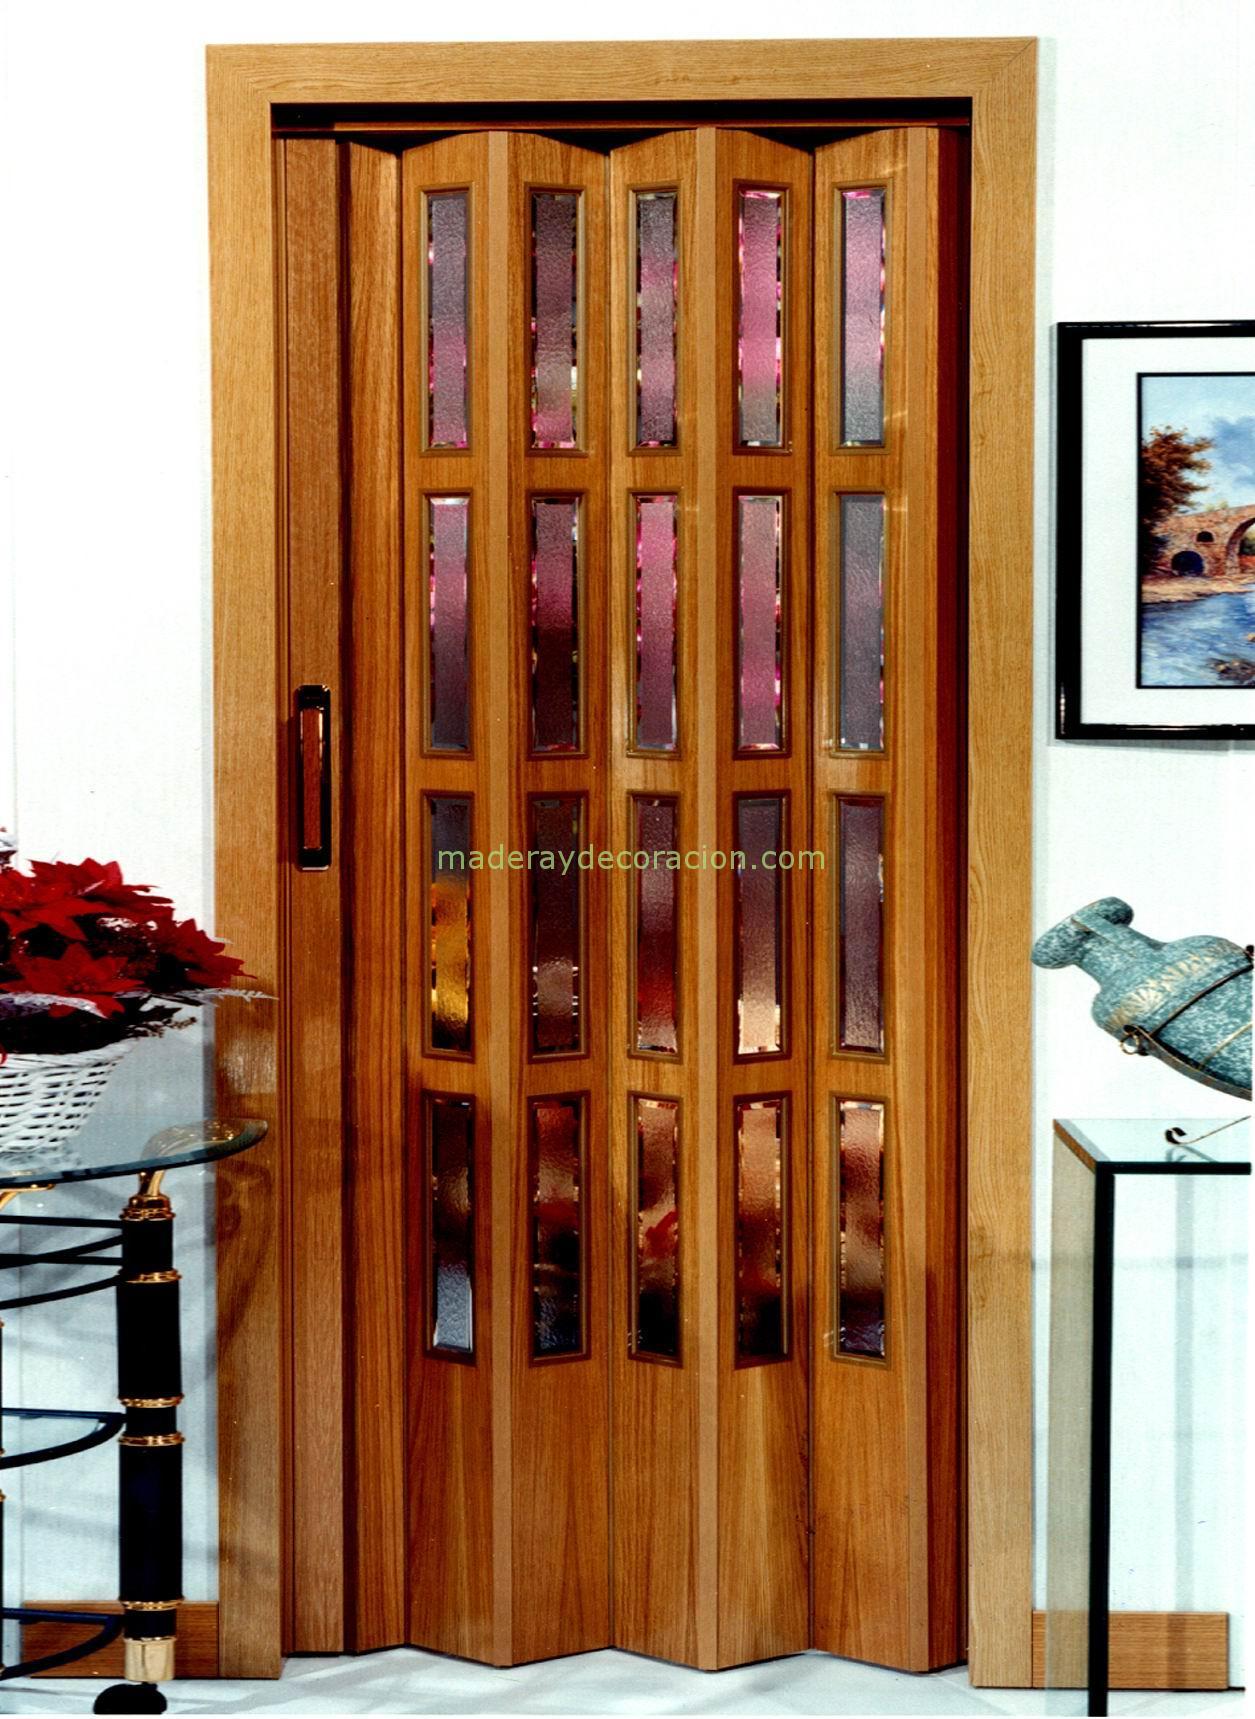 Puertas plegables madera natural - Puerta corredera plegable ...